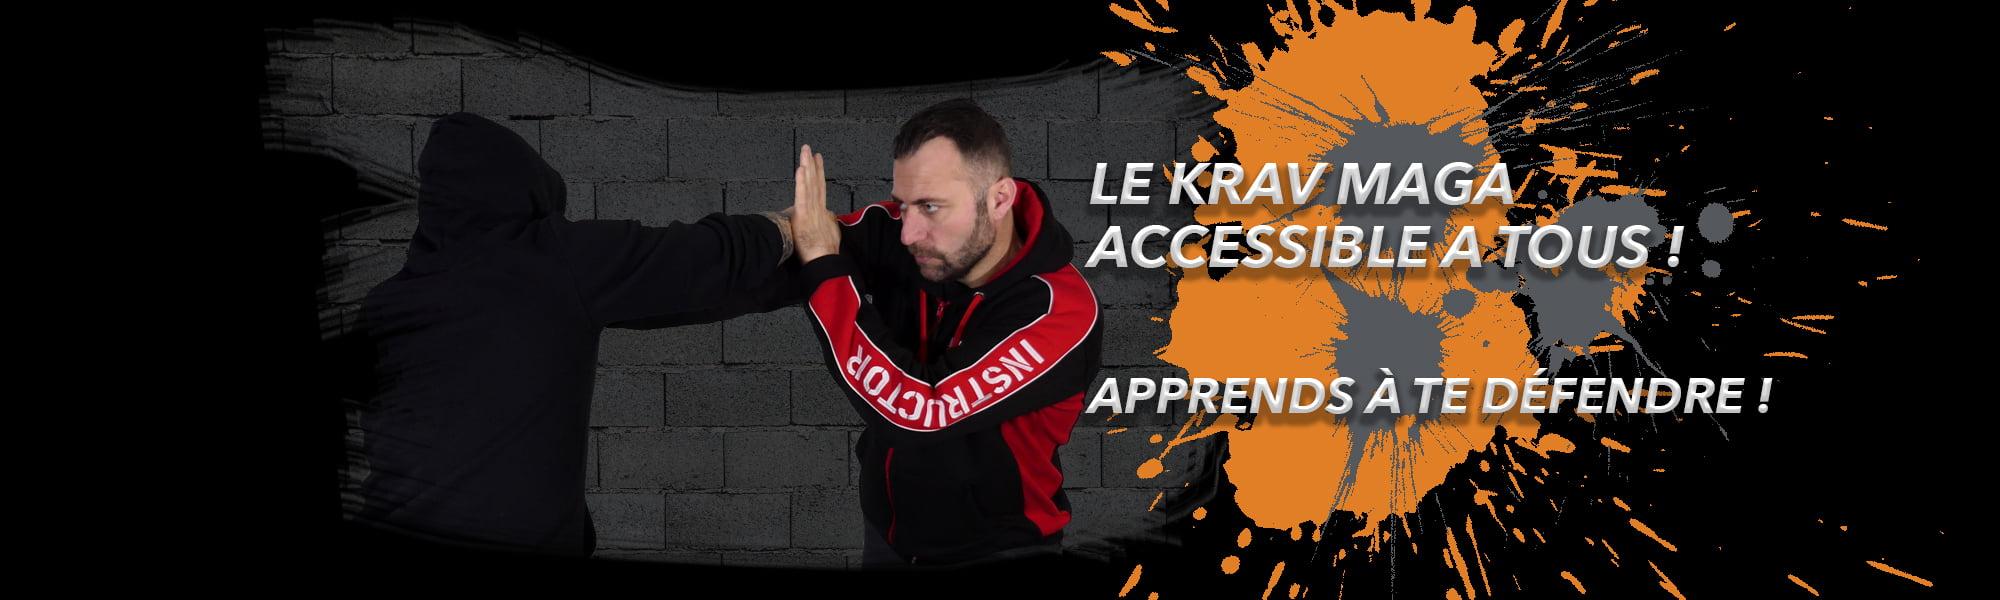 Evénements de Krav Maga Vosges Golbey